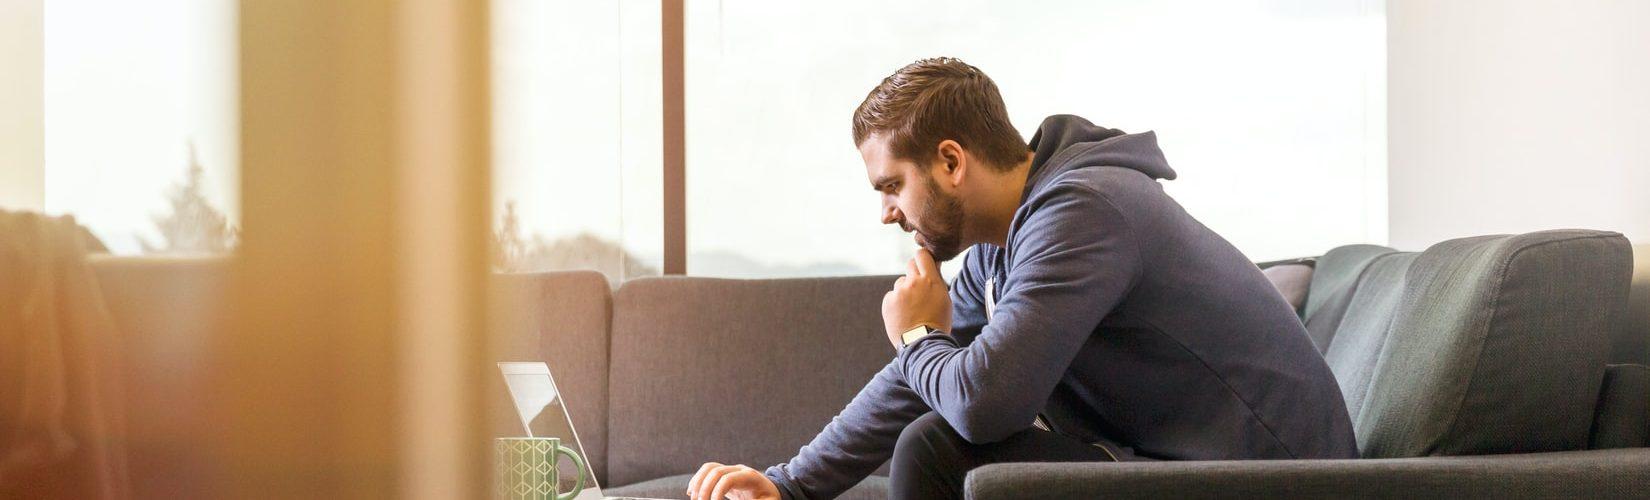 laptop-jongen-business